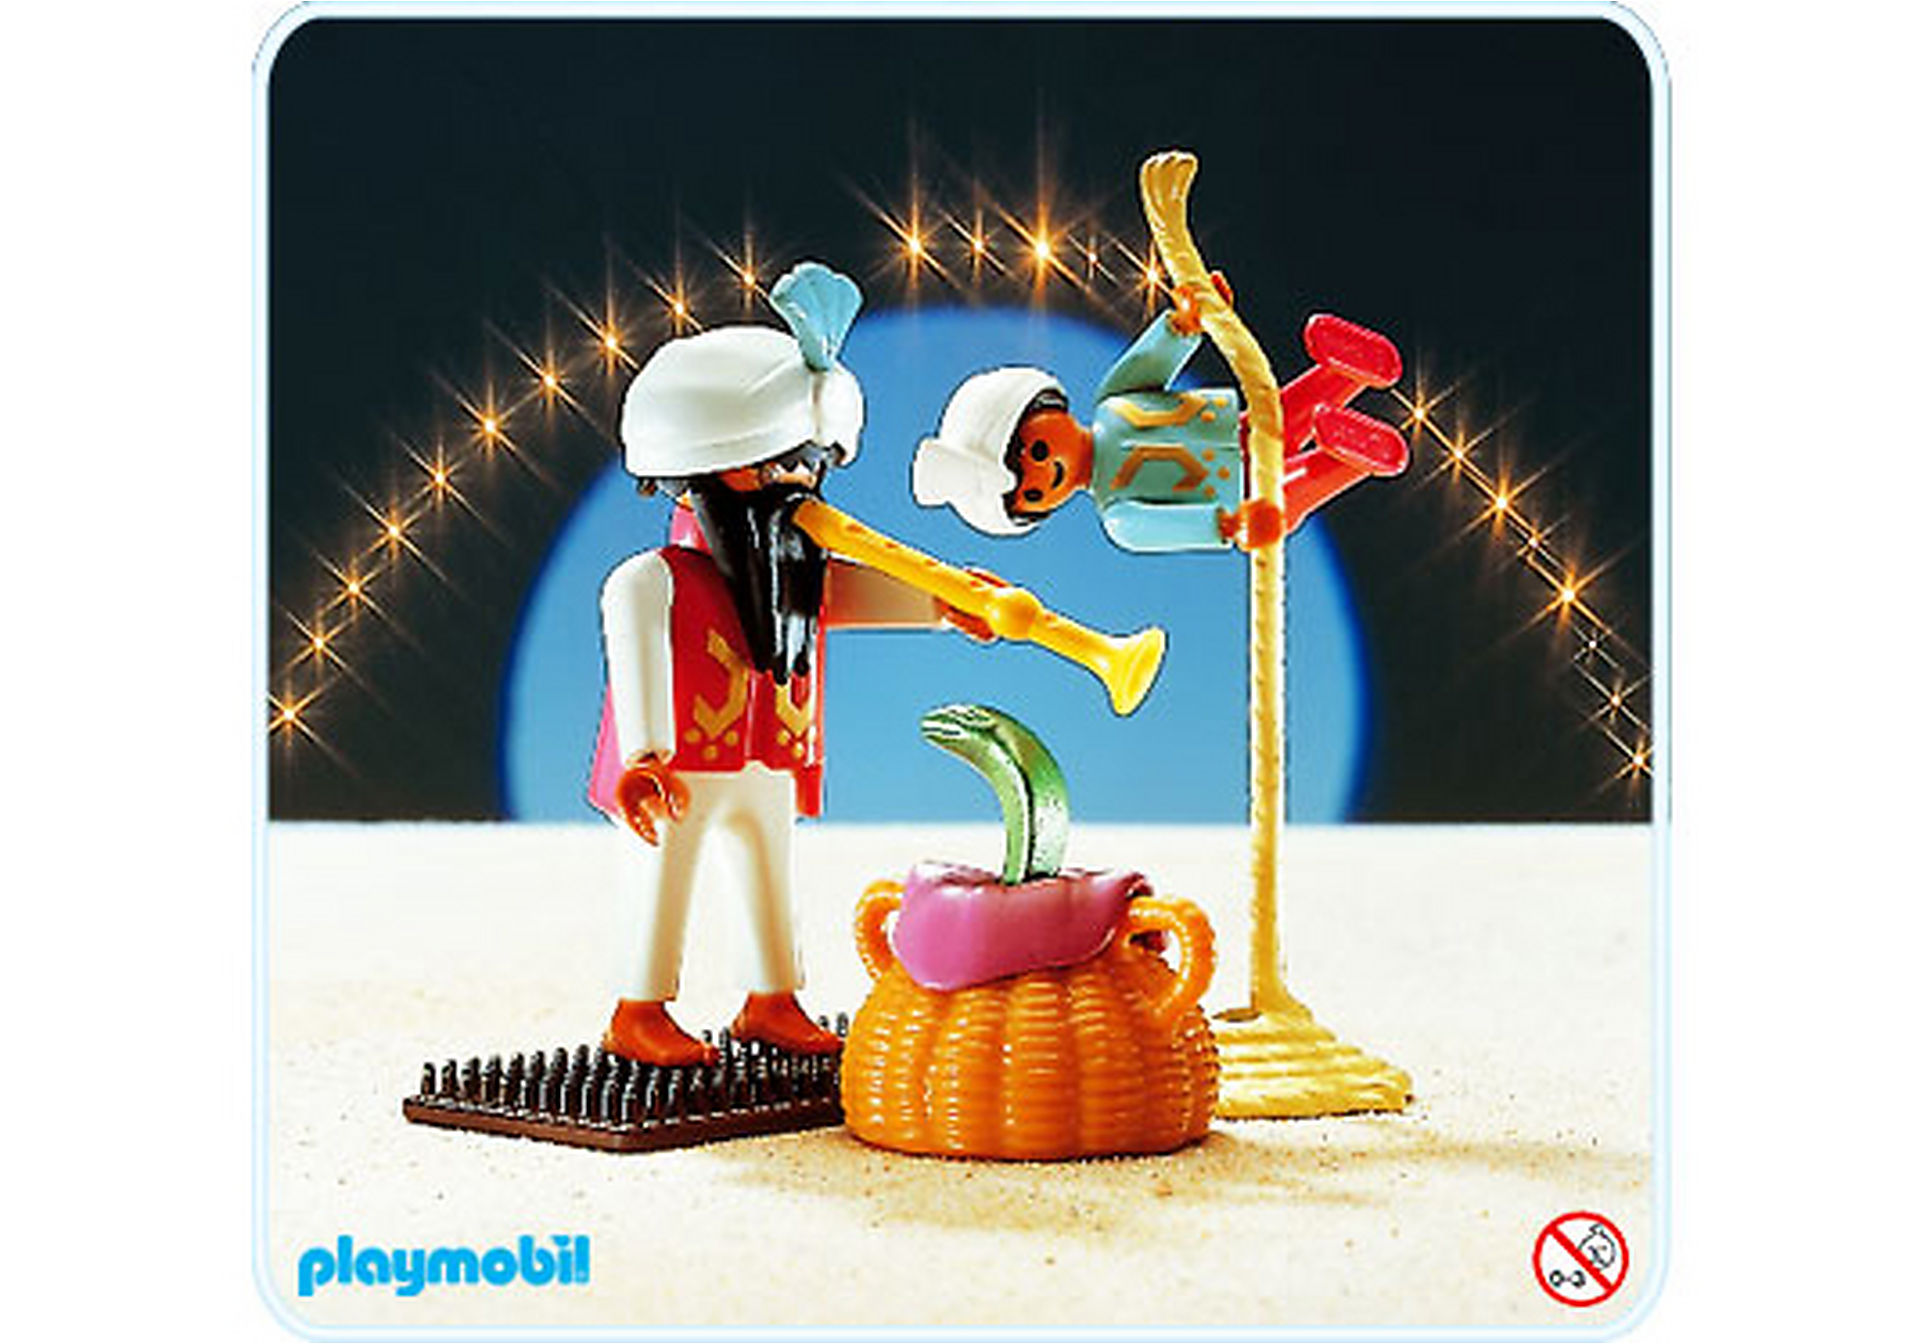 http://media.playmobil.com/i/playmobil/3398-A_product_detail/Fakir/Nagelbrett